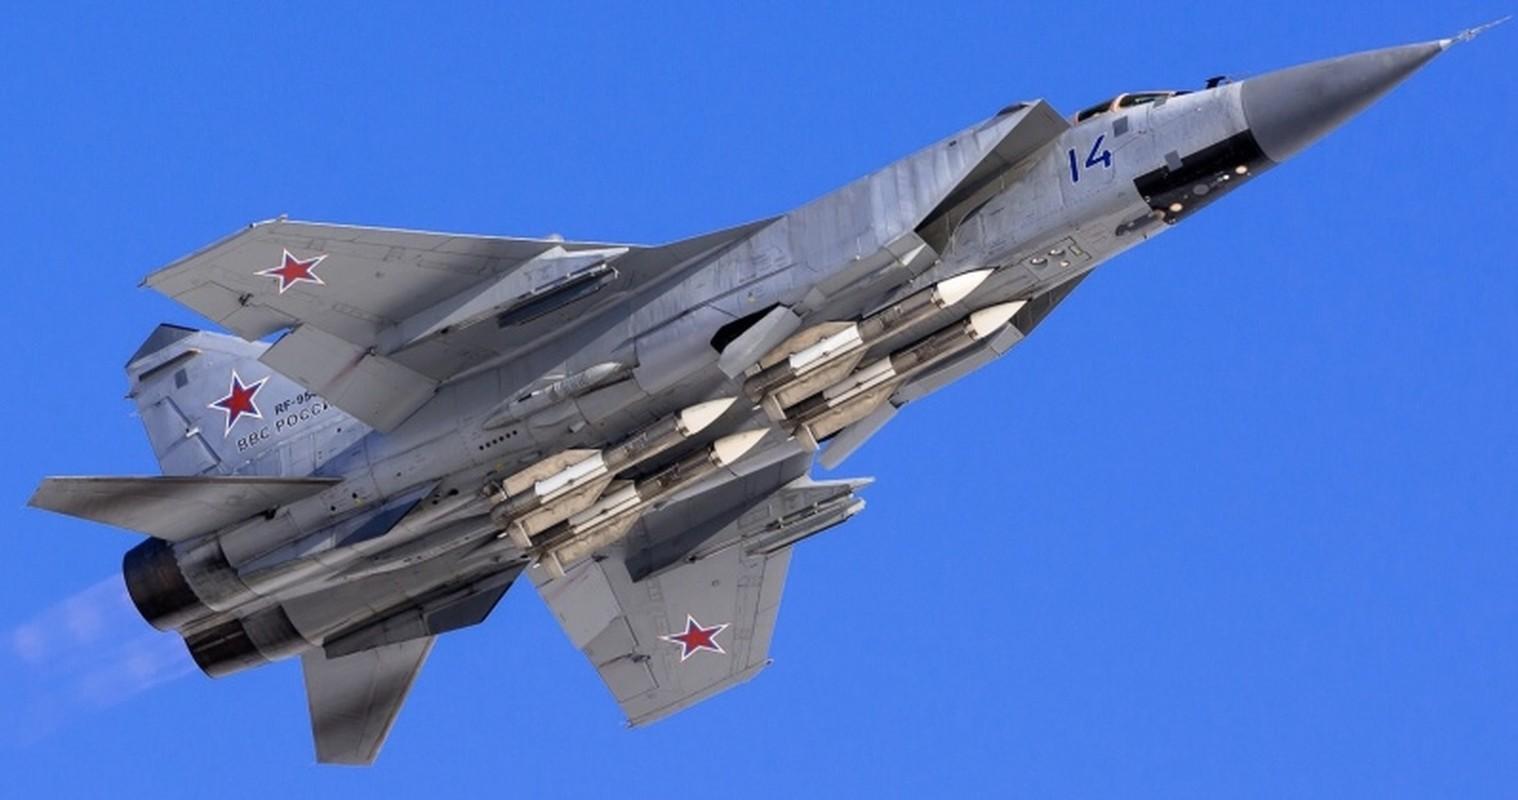 Bi mat dang sau viec Nga trang bi cho MiG-31 ten lua tam ngan